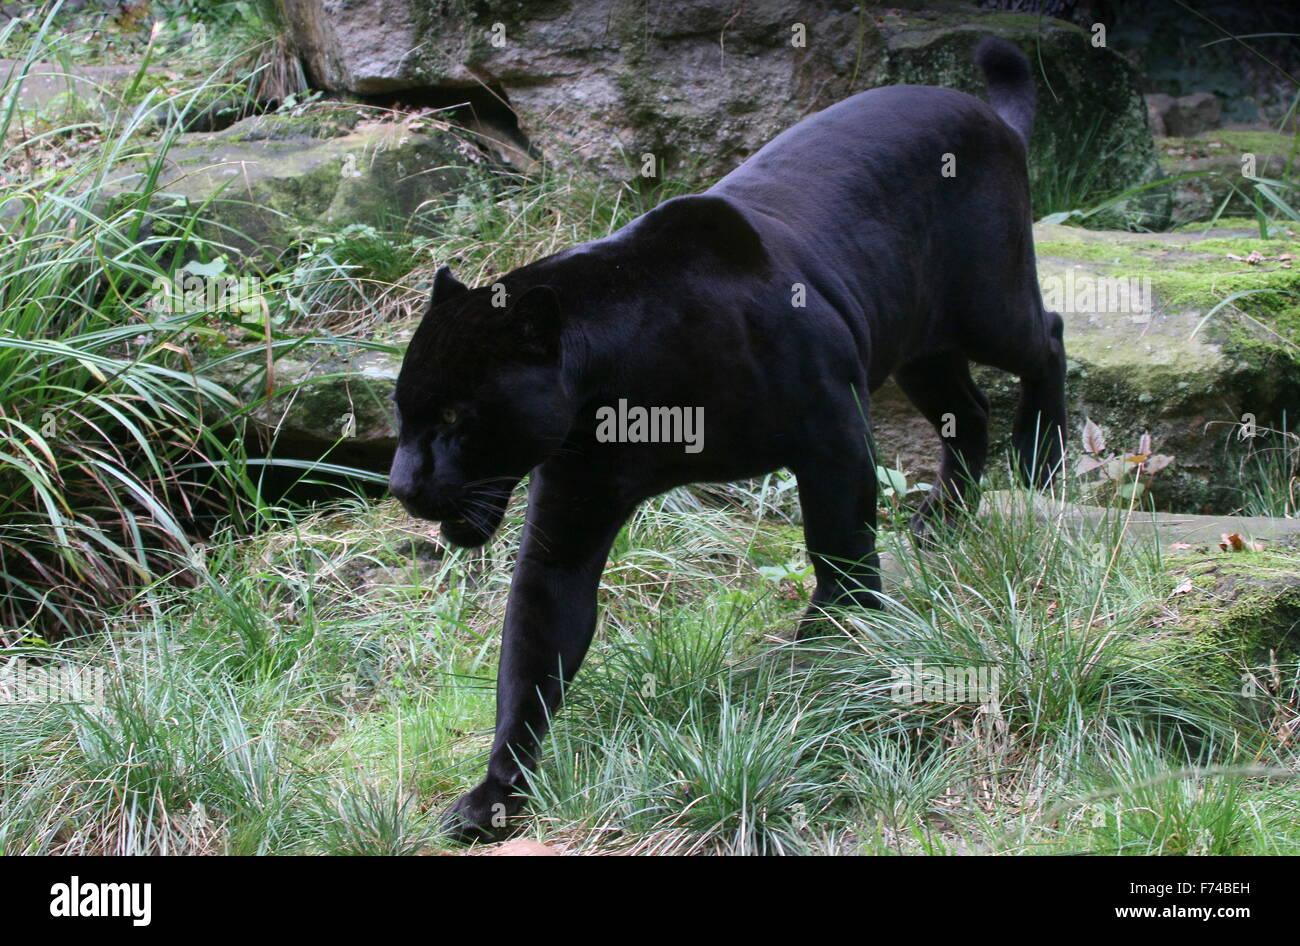 Sul Americano Masculino Black Jaguar (Panthera Onca) à Espreita